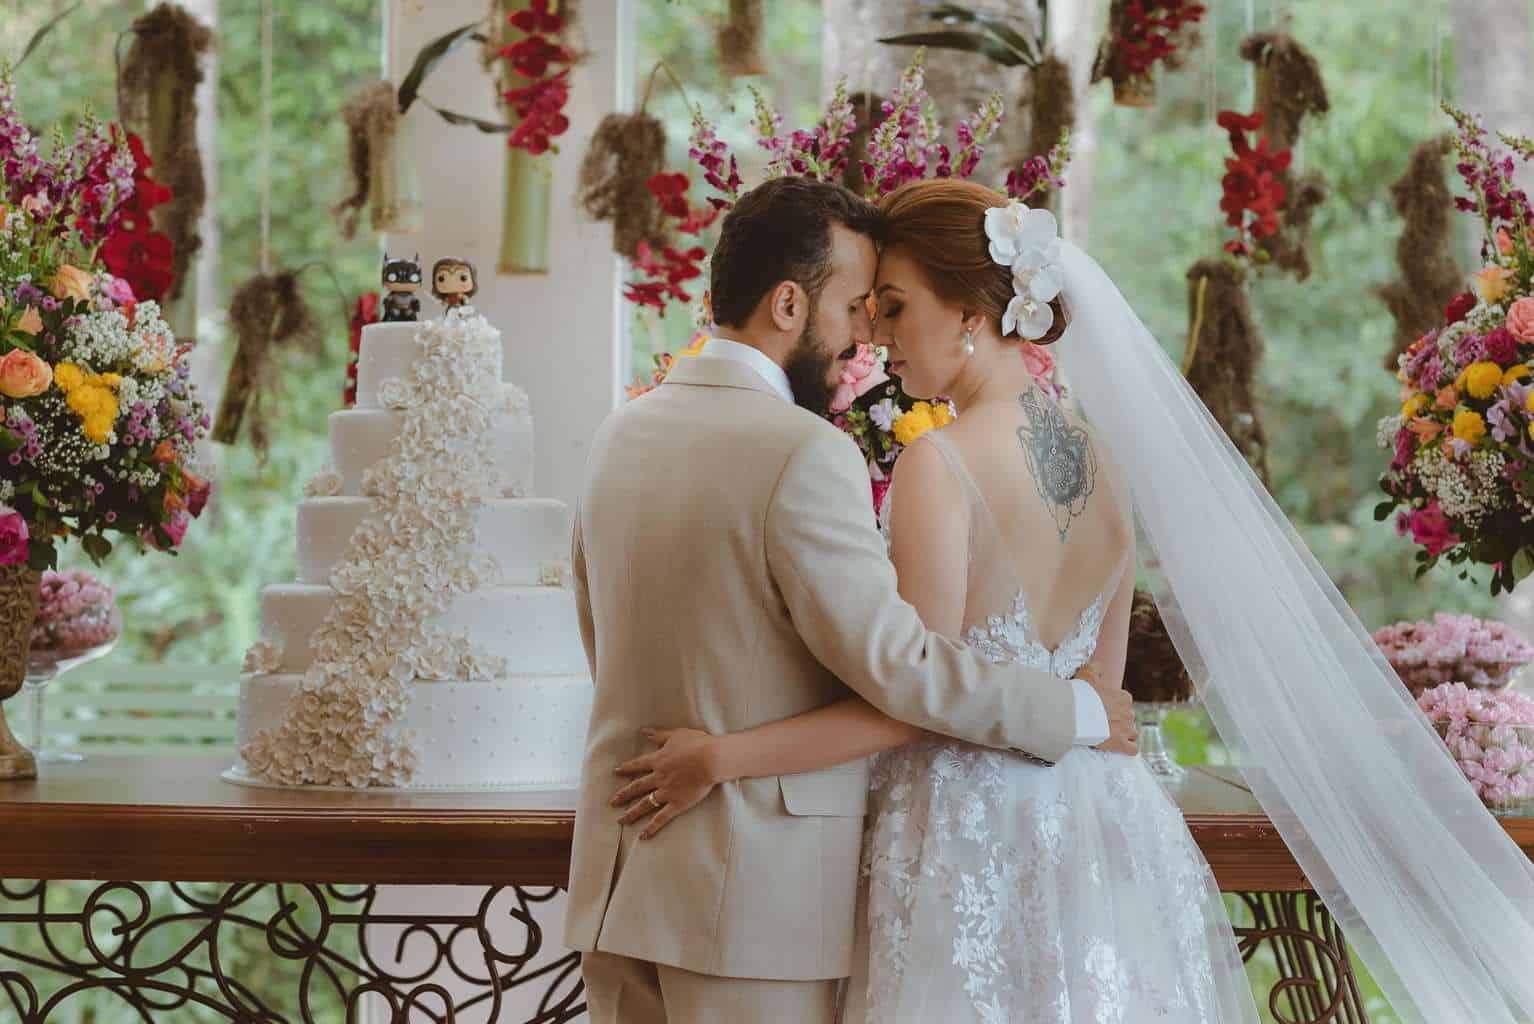 casamento-ao-ar-livre-casamento-boho-casamento-geek-casamento-rustico-casamento-Thais-e-Pedro-Revoar-Fotografia-Villa-Borghese-Eventos-51